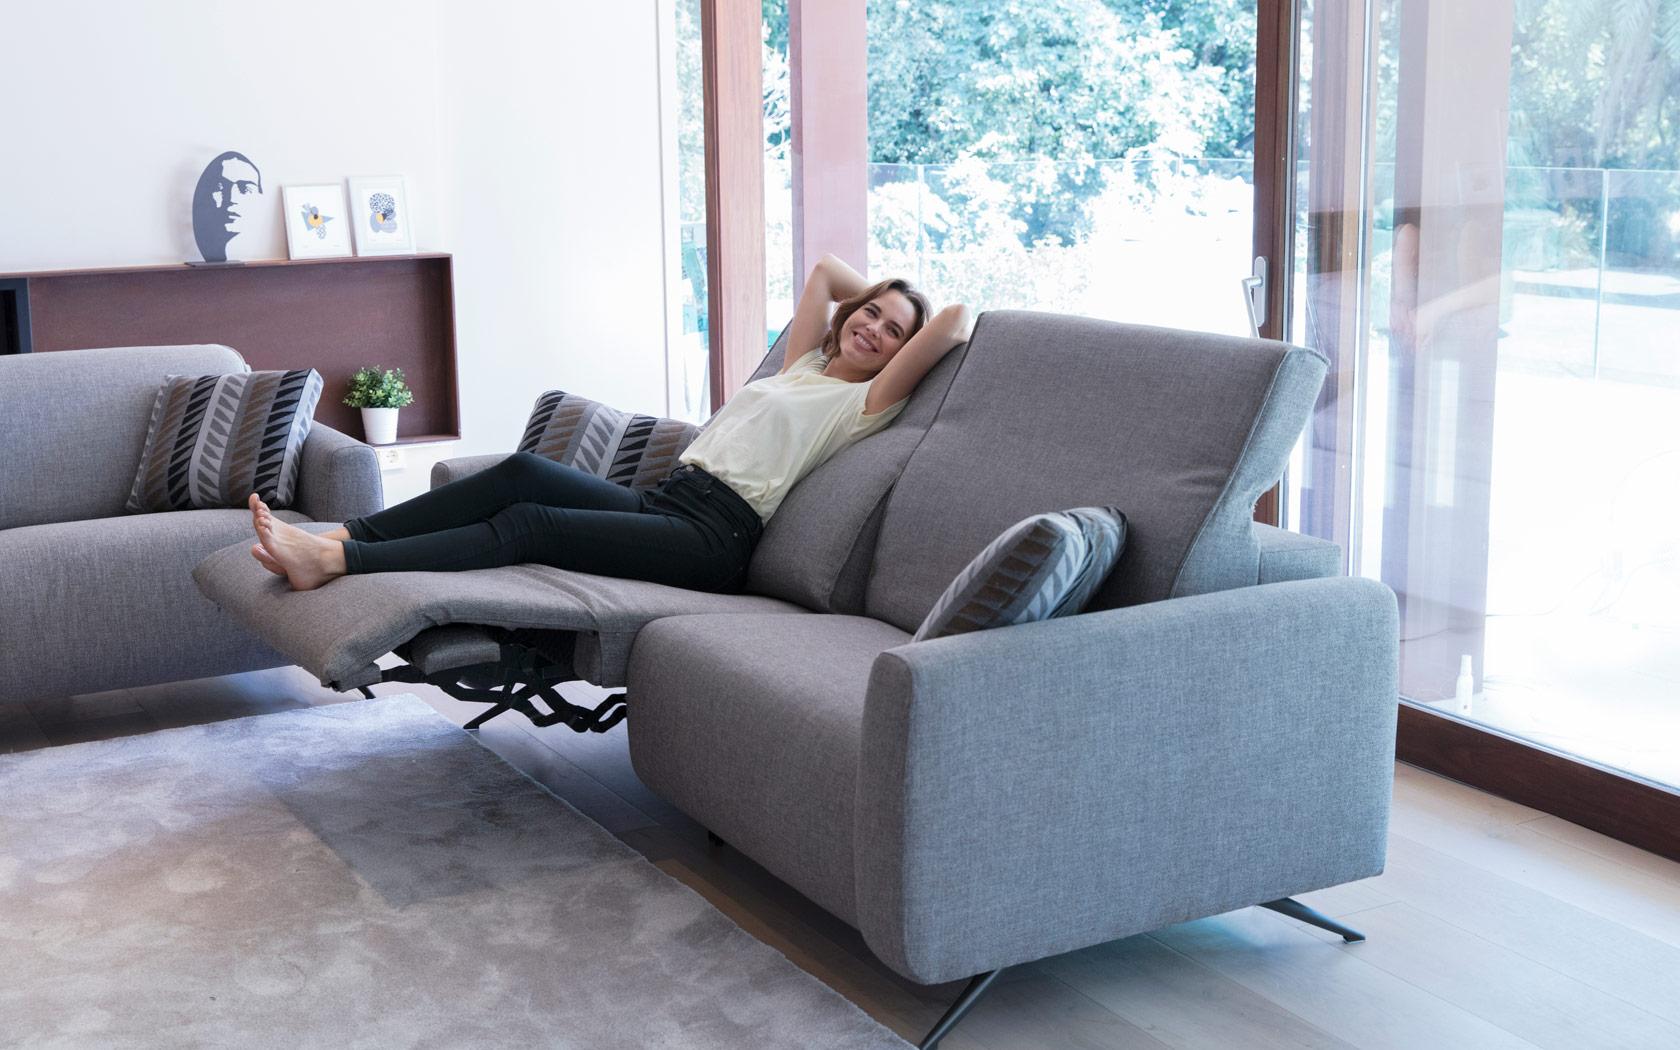 Baltia sofa relax 2020 07